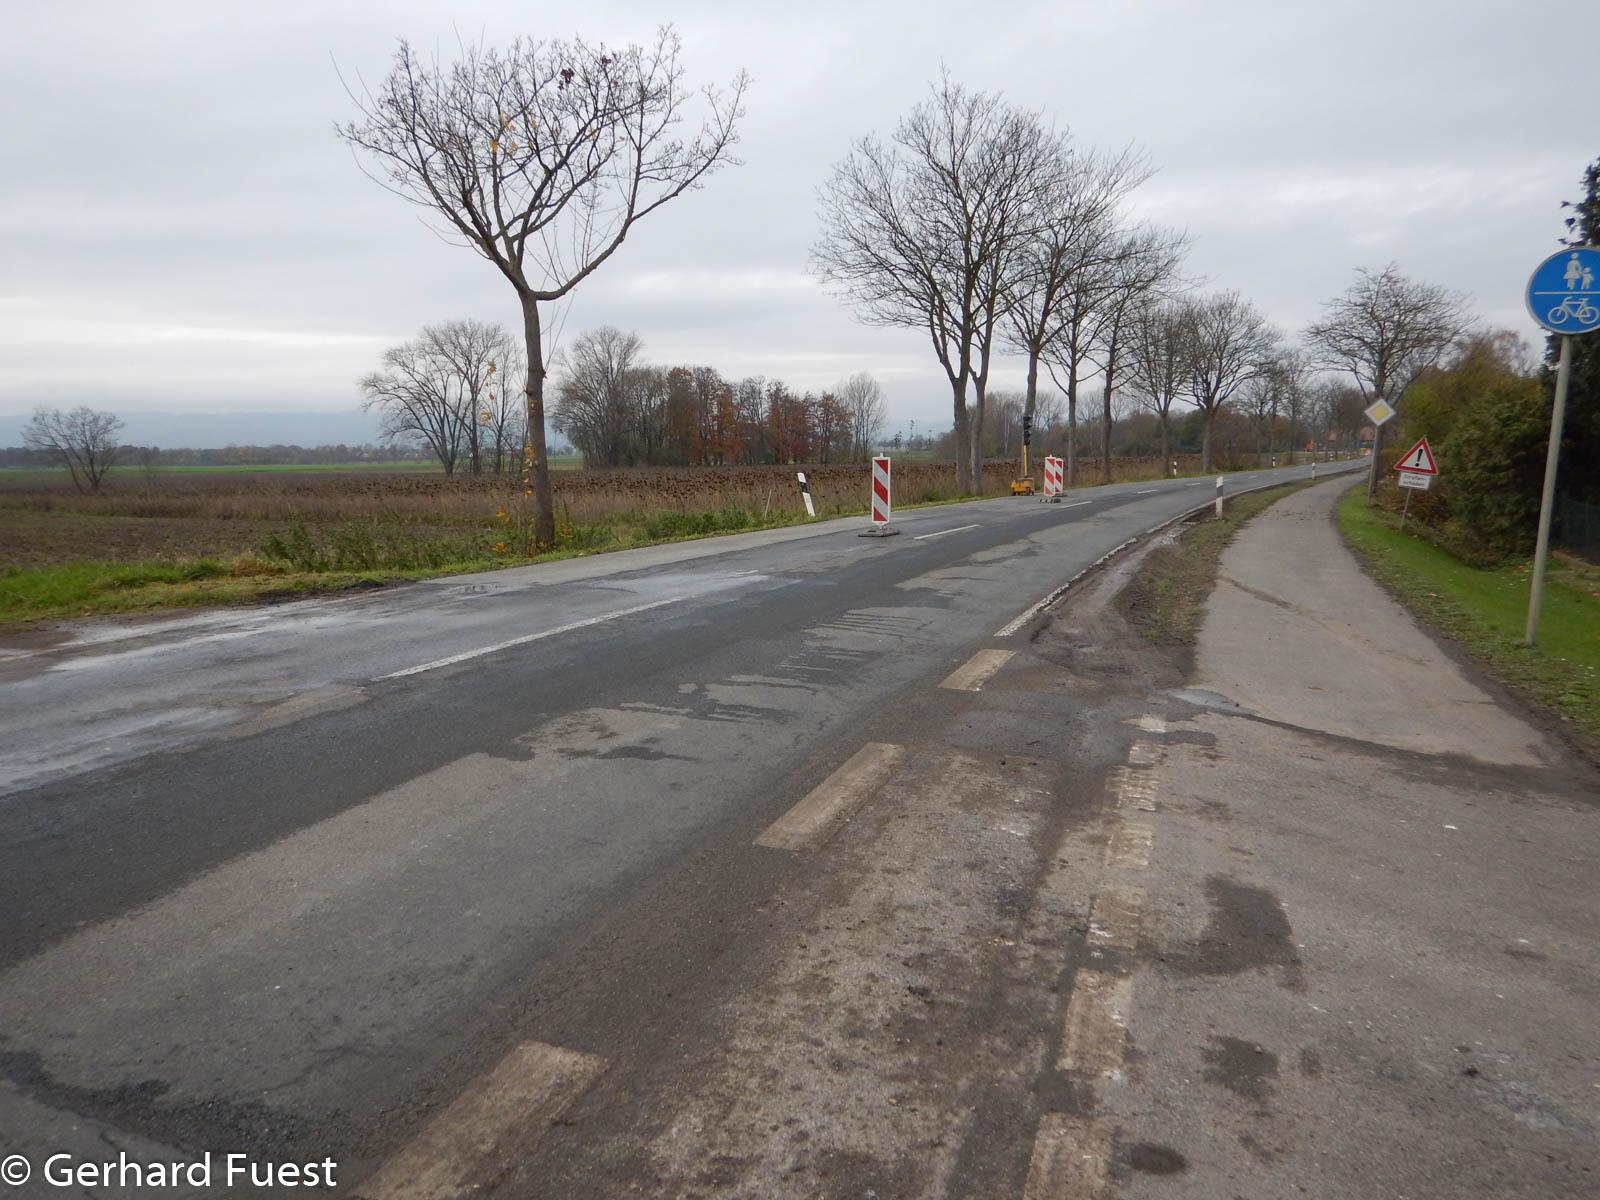 Bauarbeiten an der Umgehungsstrasse, sowohl Baumschnitt als auch Fahrbahnarbeiten